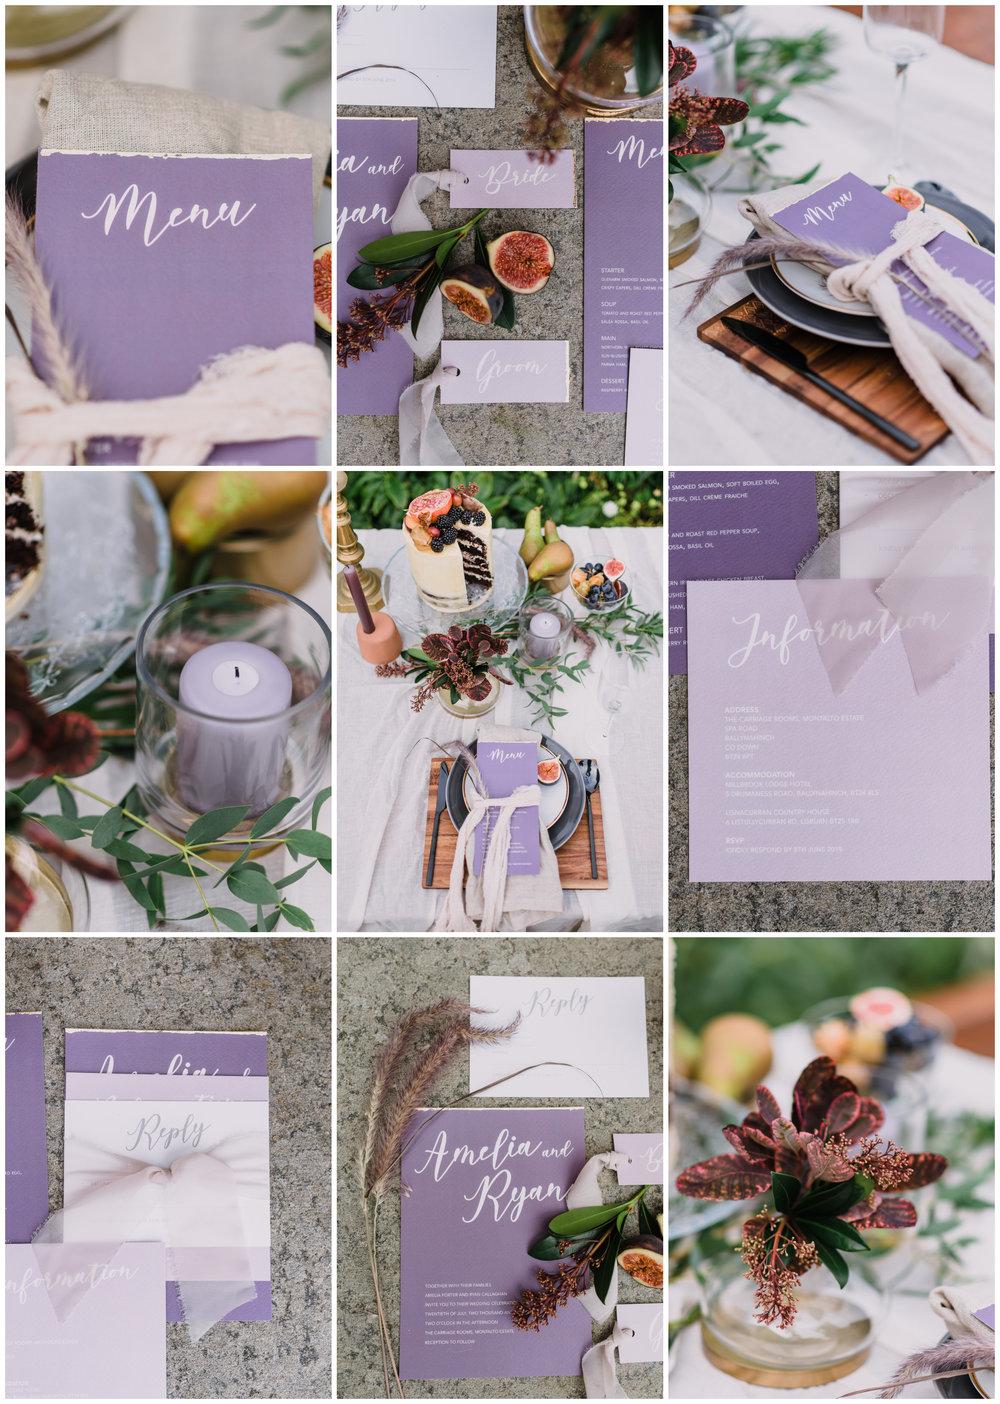 autumn at the carriage rooms, montalto estate, naked wedding cake, purple wedding invitations, autumnal wedding stationery.jpg